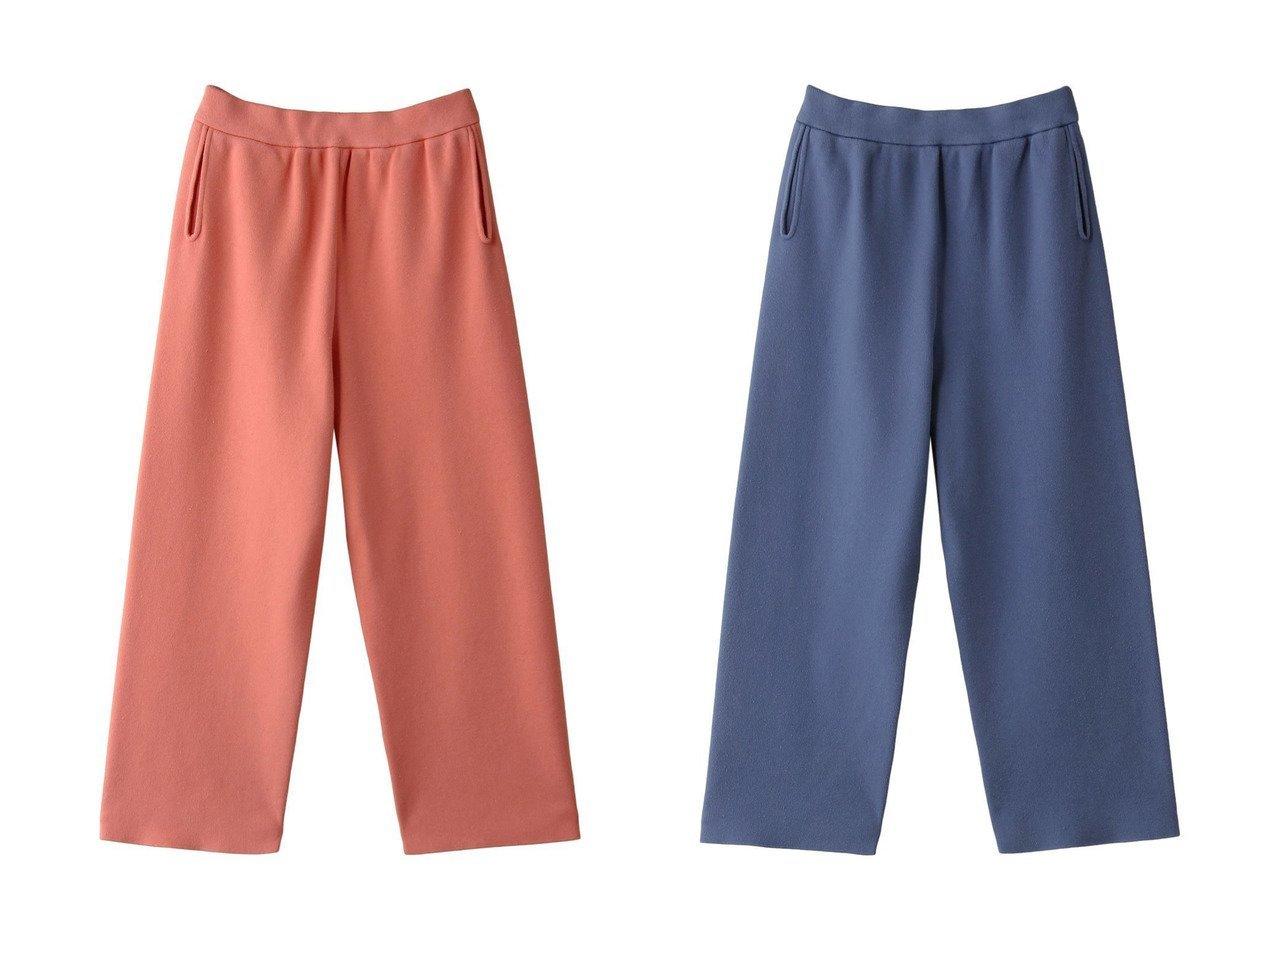 【JAMAIS VU/ジャメヴ】のSUVIN オゾン加工コットンニットパンツ パンツのおすすめ!人気、トレンド・レディースファッションの通販 おすすめで人気の流行・トレンド、ファッションの通販商品 メンズファッション・キッズファッション・インテリア・家具・レディースファッション・服の通販 founy(ファニー) https://founy.com/ ファッション Fashion レディースファッション WOMEN パンツ Pants 2021年 2021 2021 春夏 S/S SS Spring/Summer 2021 S/S 春夏 SS Spring/Summer なめらか クロップド リラックス ワイド 定番 Standard 春 Spring |ID:crp329100000025326